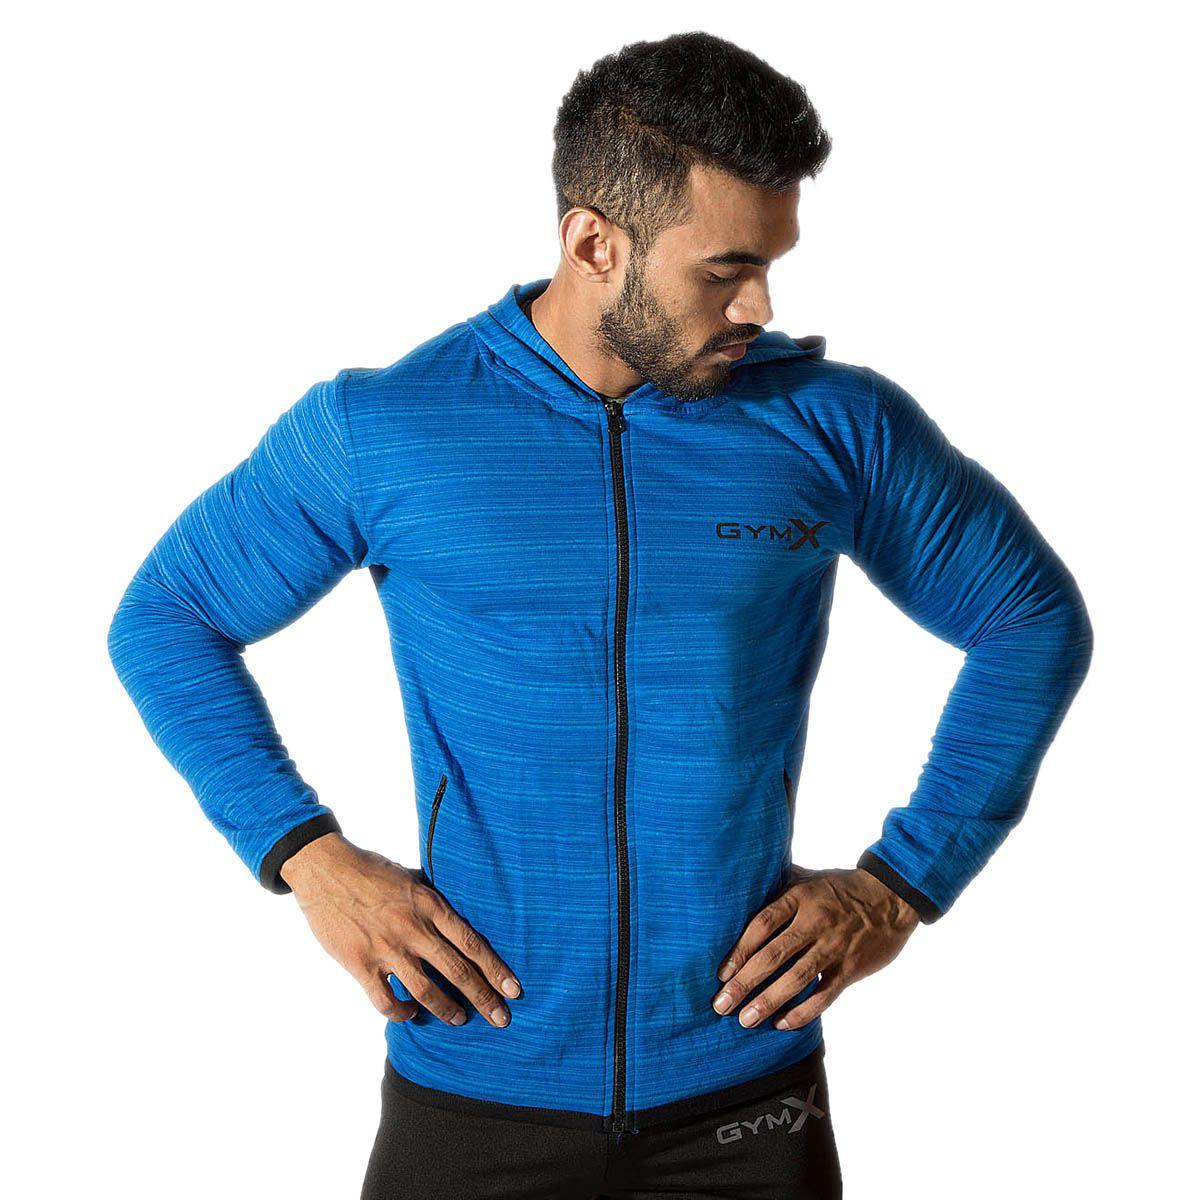 GymX Mens Cotton Legacy Hoodies- Arabian Blue